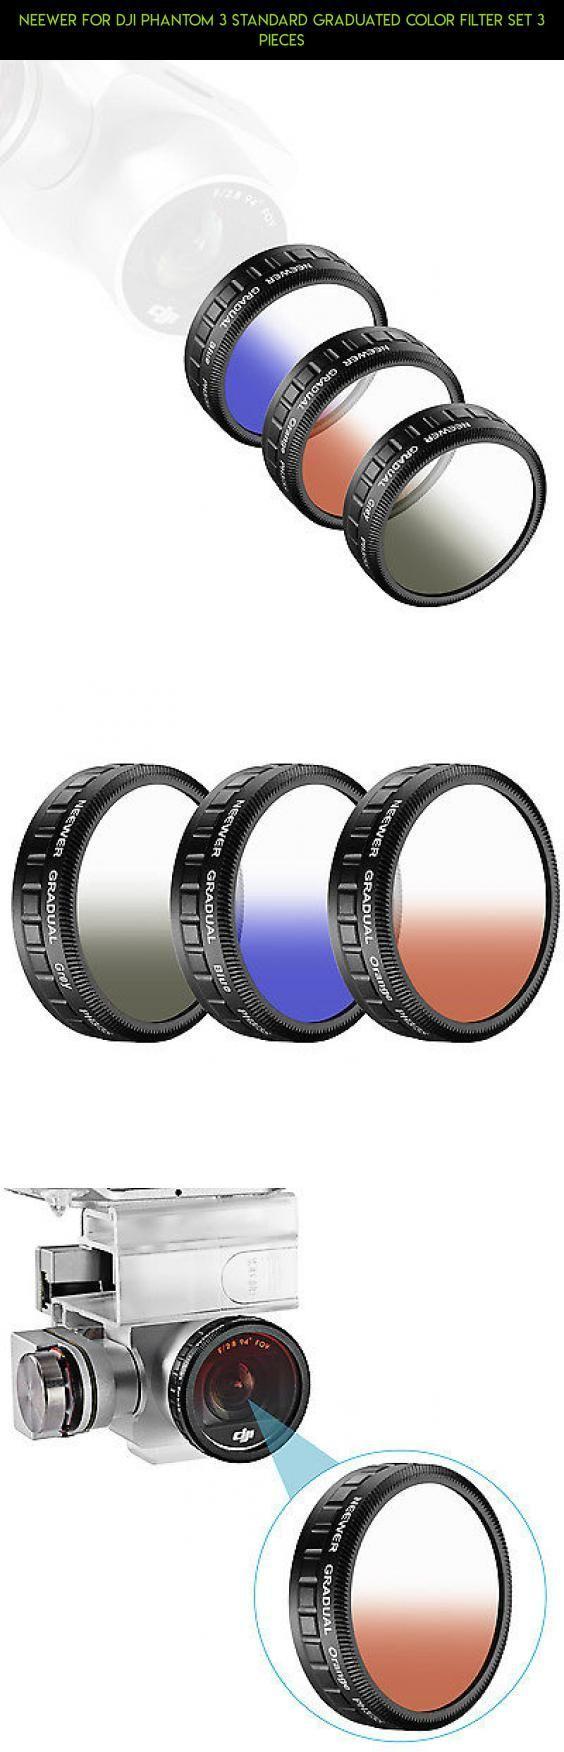 Neewer for DJI Phantom 3 Standard Graduated Color Filter Set 3 Pieces #set #drone #shopping #dji #products #fpv #racing #filter #camera #technology #kit #standard #parts #plans #tech #gadgets #phantom #3